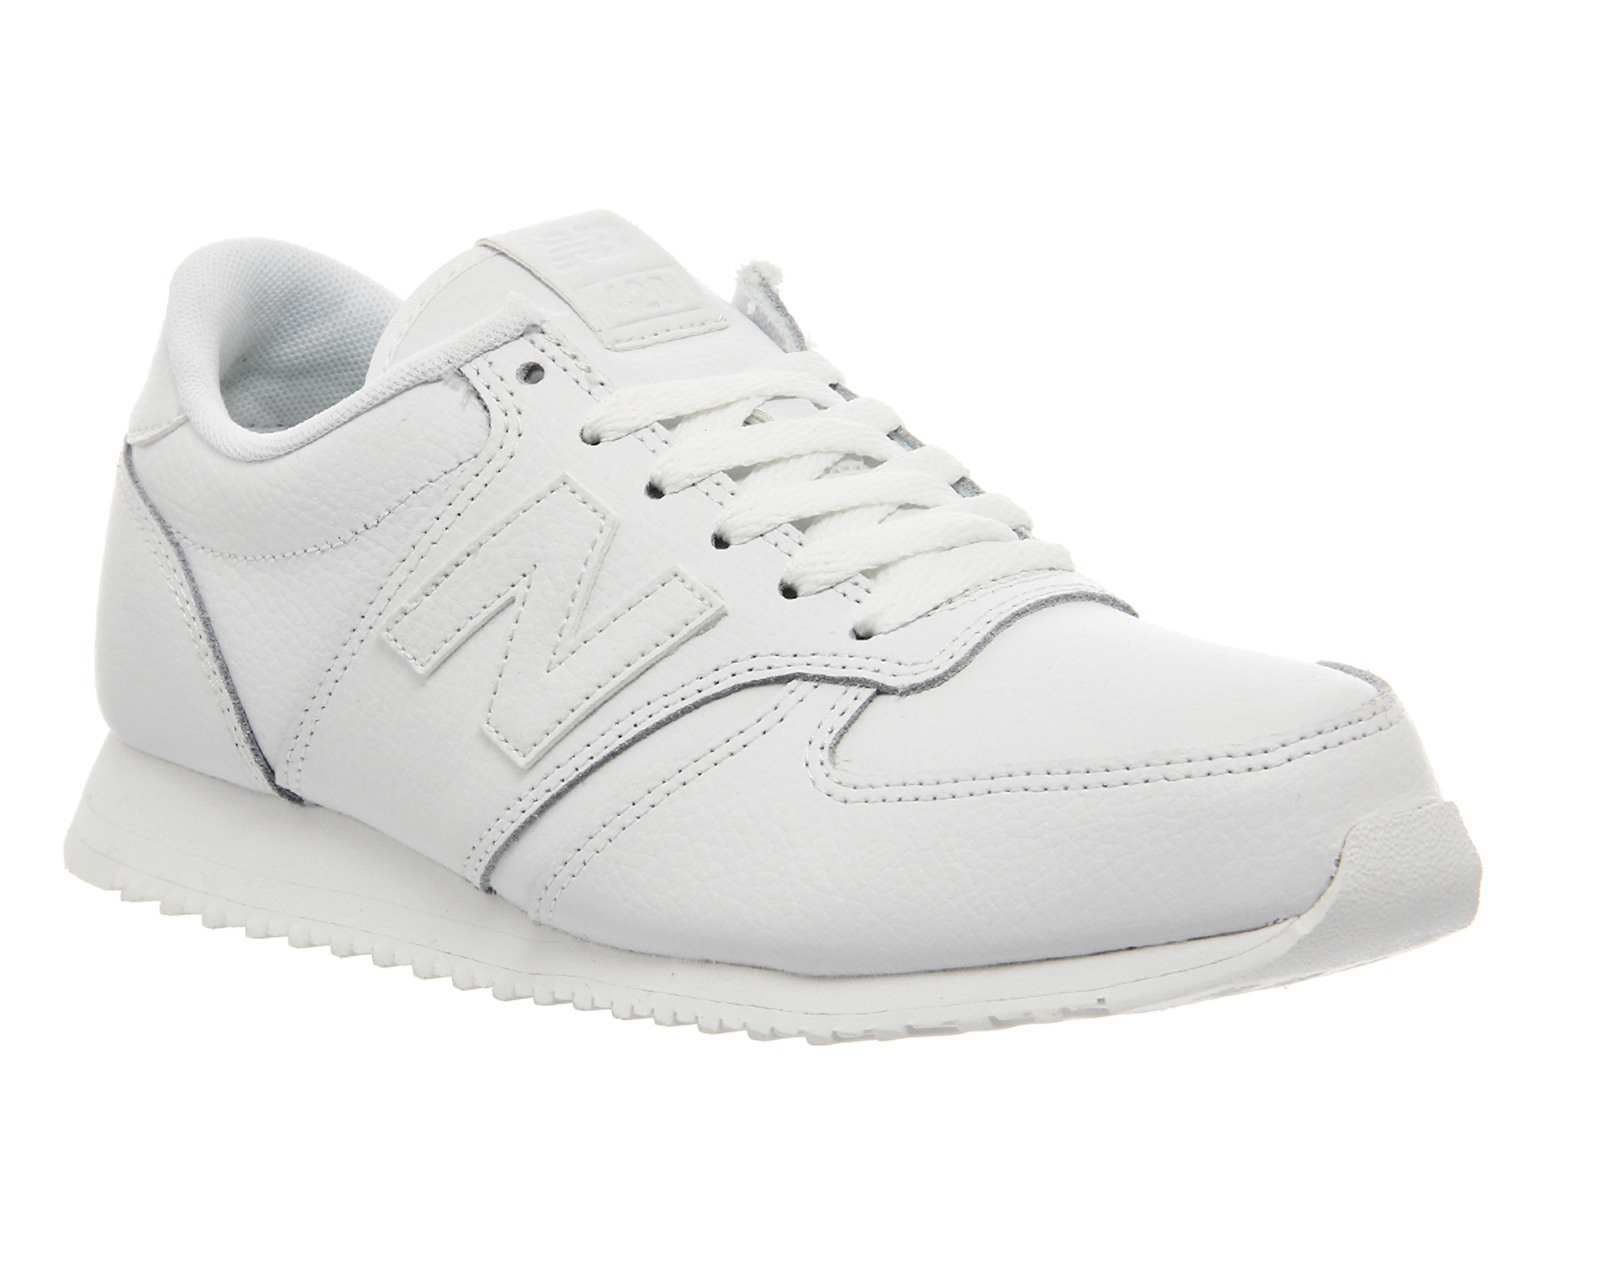 New Balance White Leather Shoes